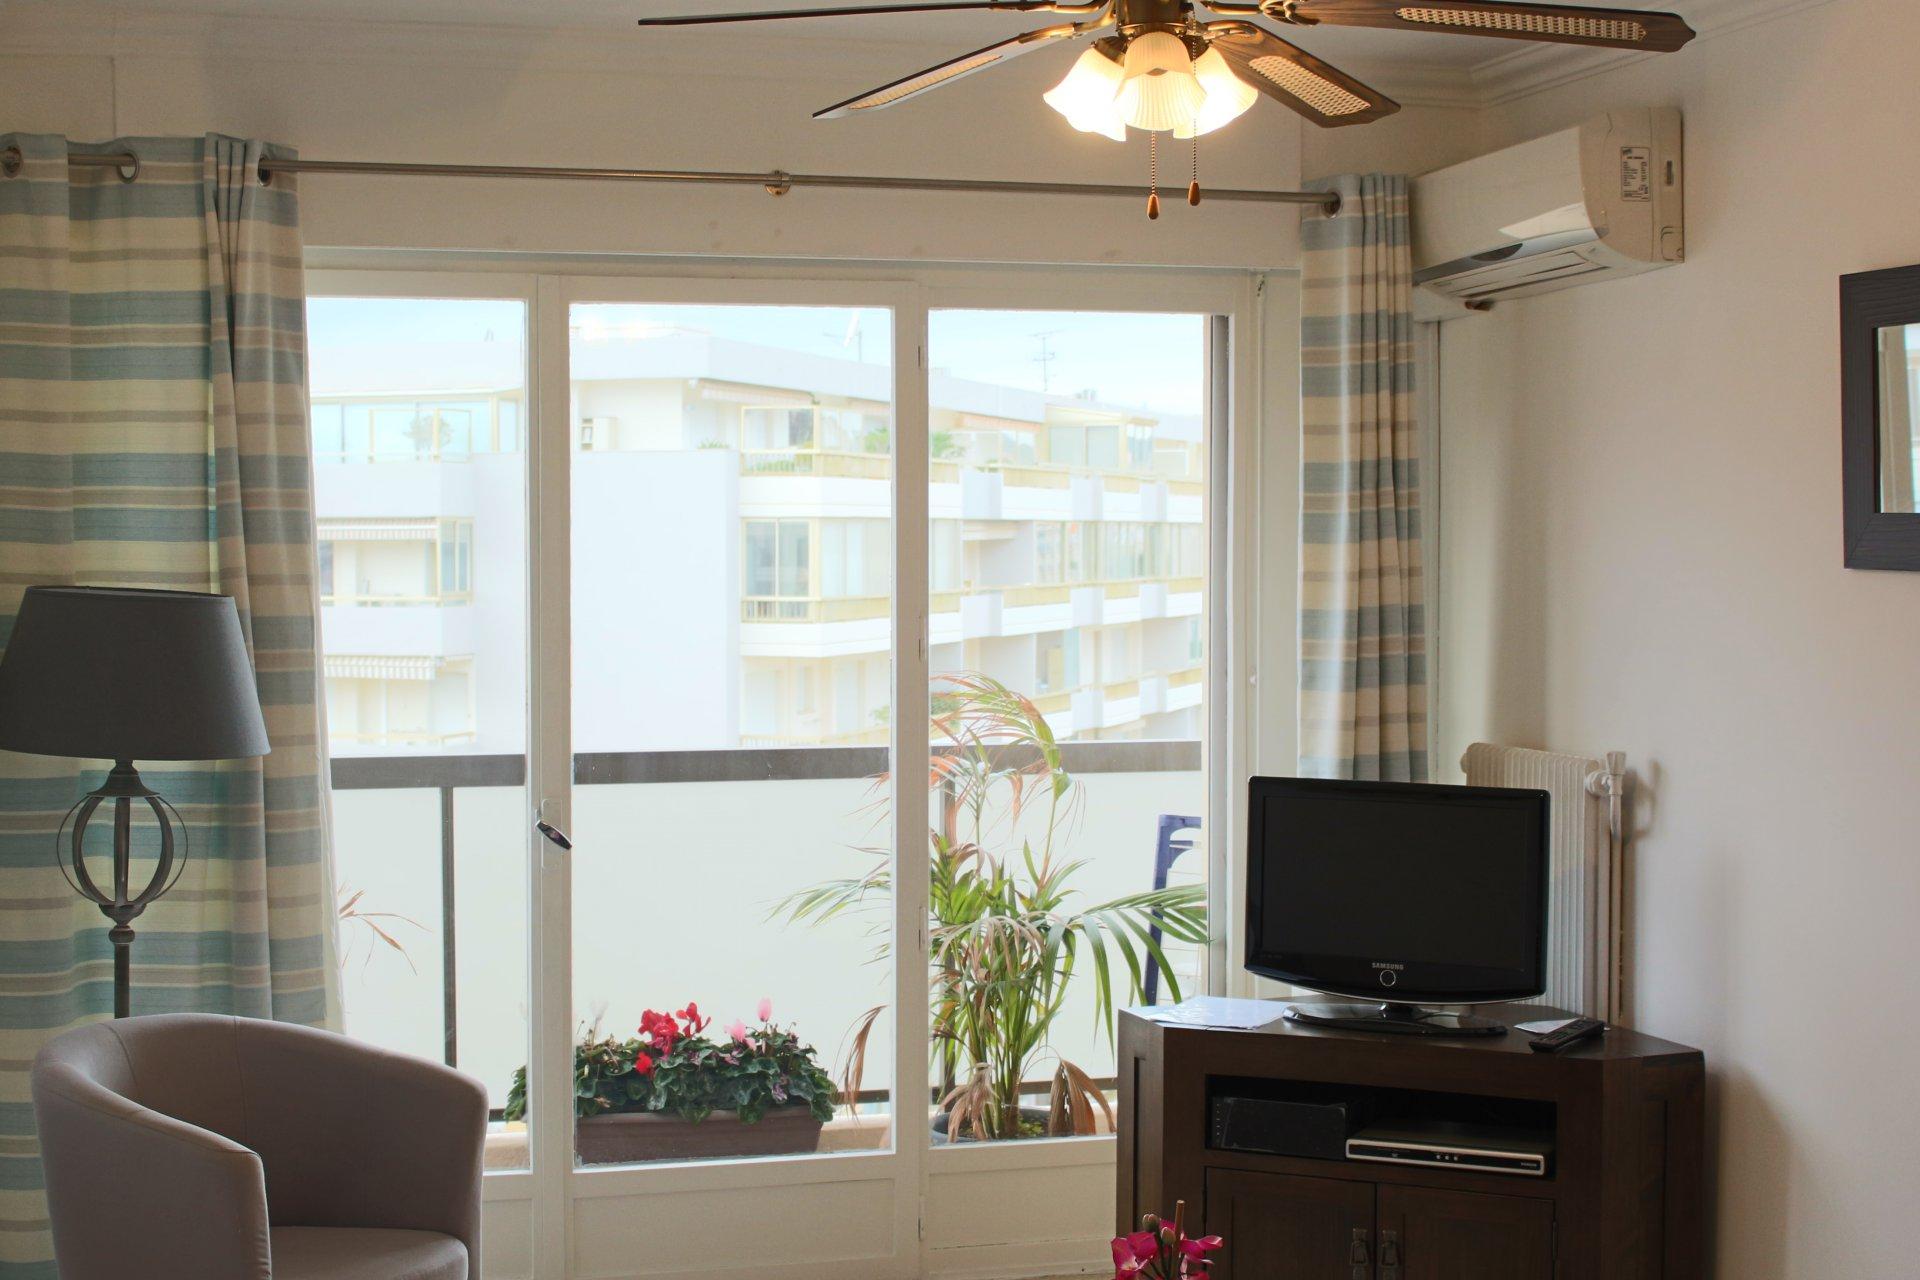 Ventilatore a soffitto, luce naturale